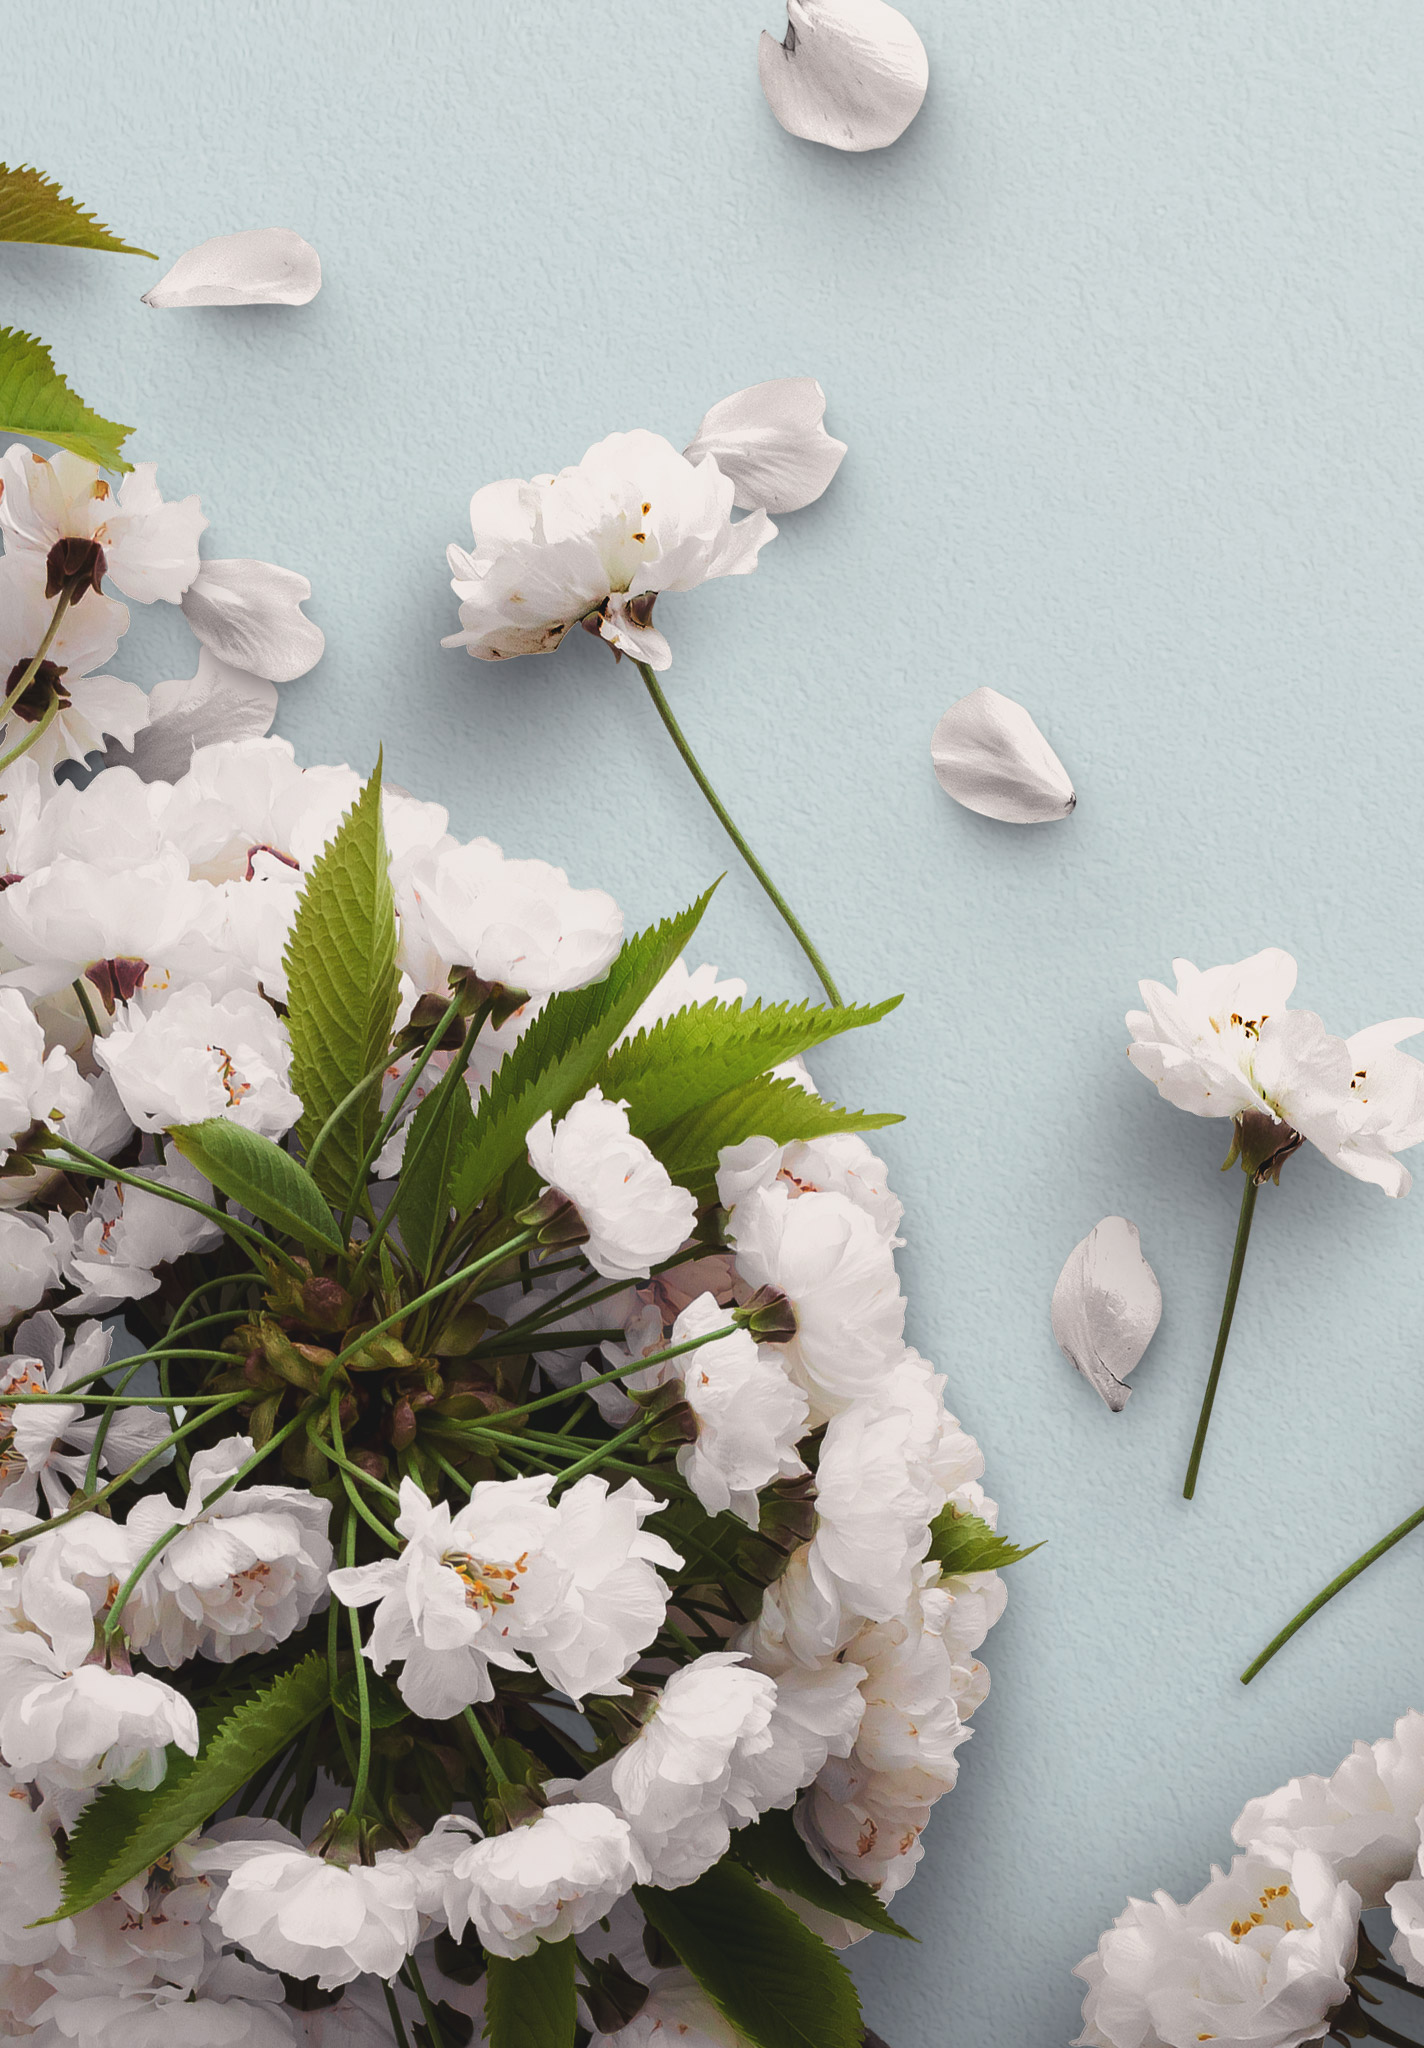 Cherry Blossoms Custom Scene Creator Template 6 Image04